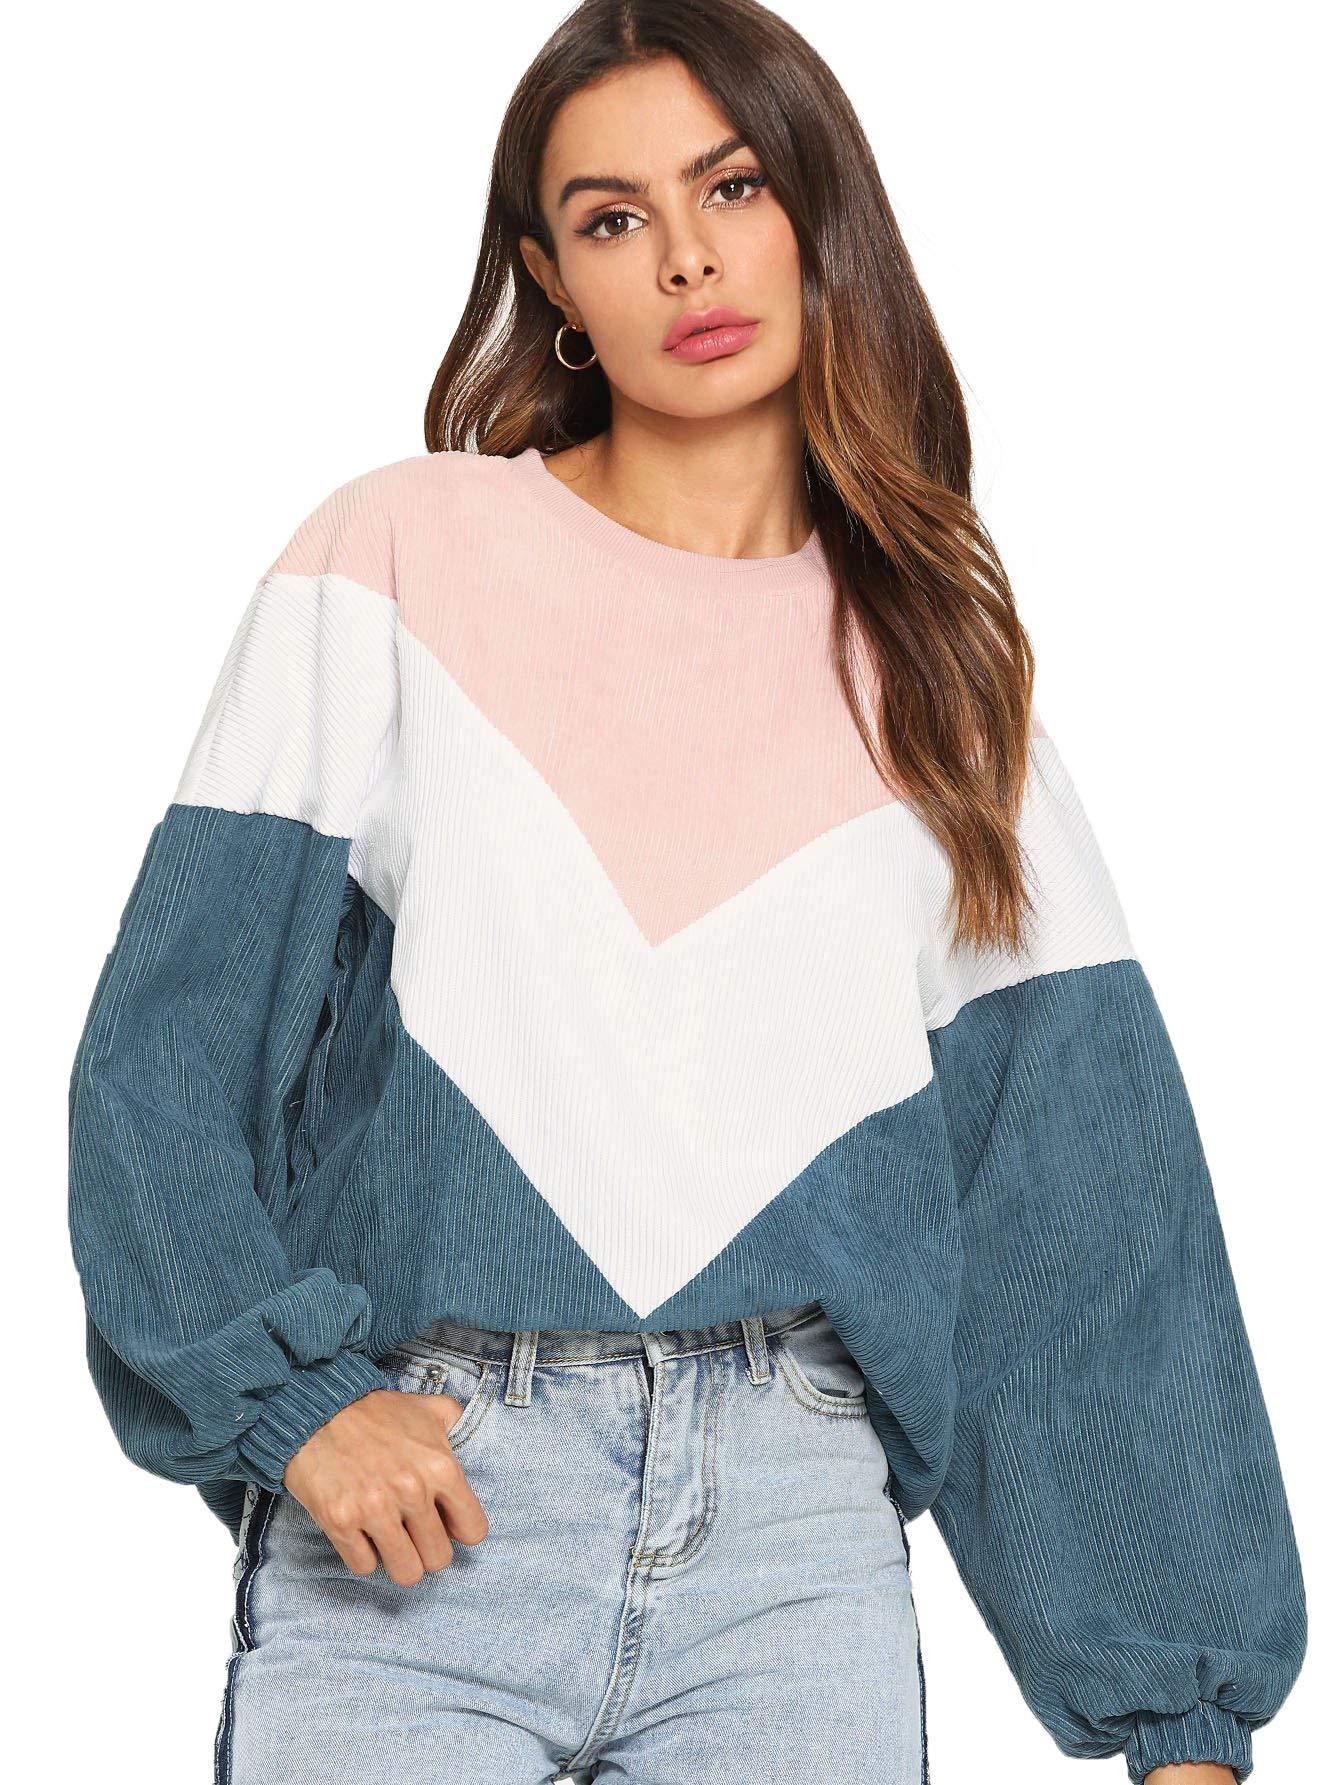 Romwe Women's Loose Colorblock Sweatshirt Lantern Sleeve Round Neck Pullover Tops